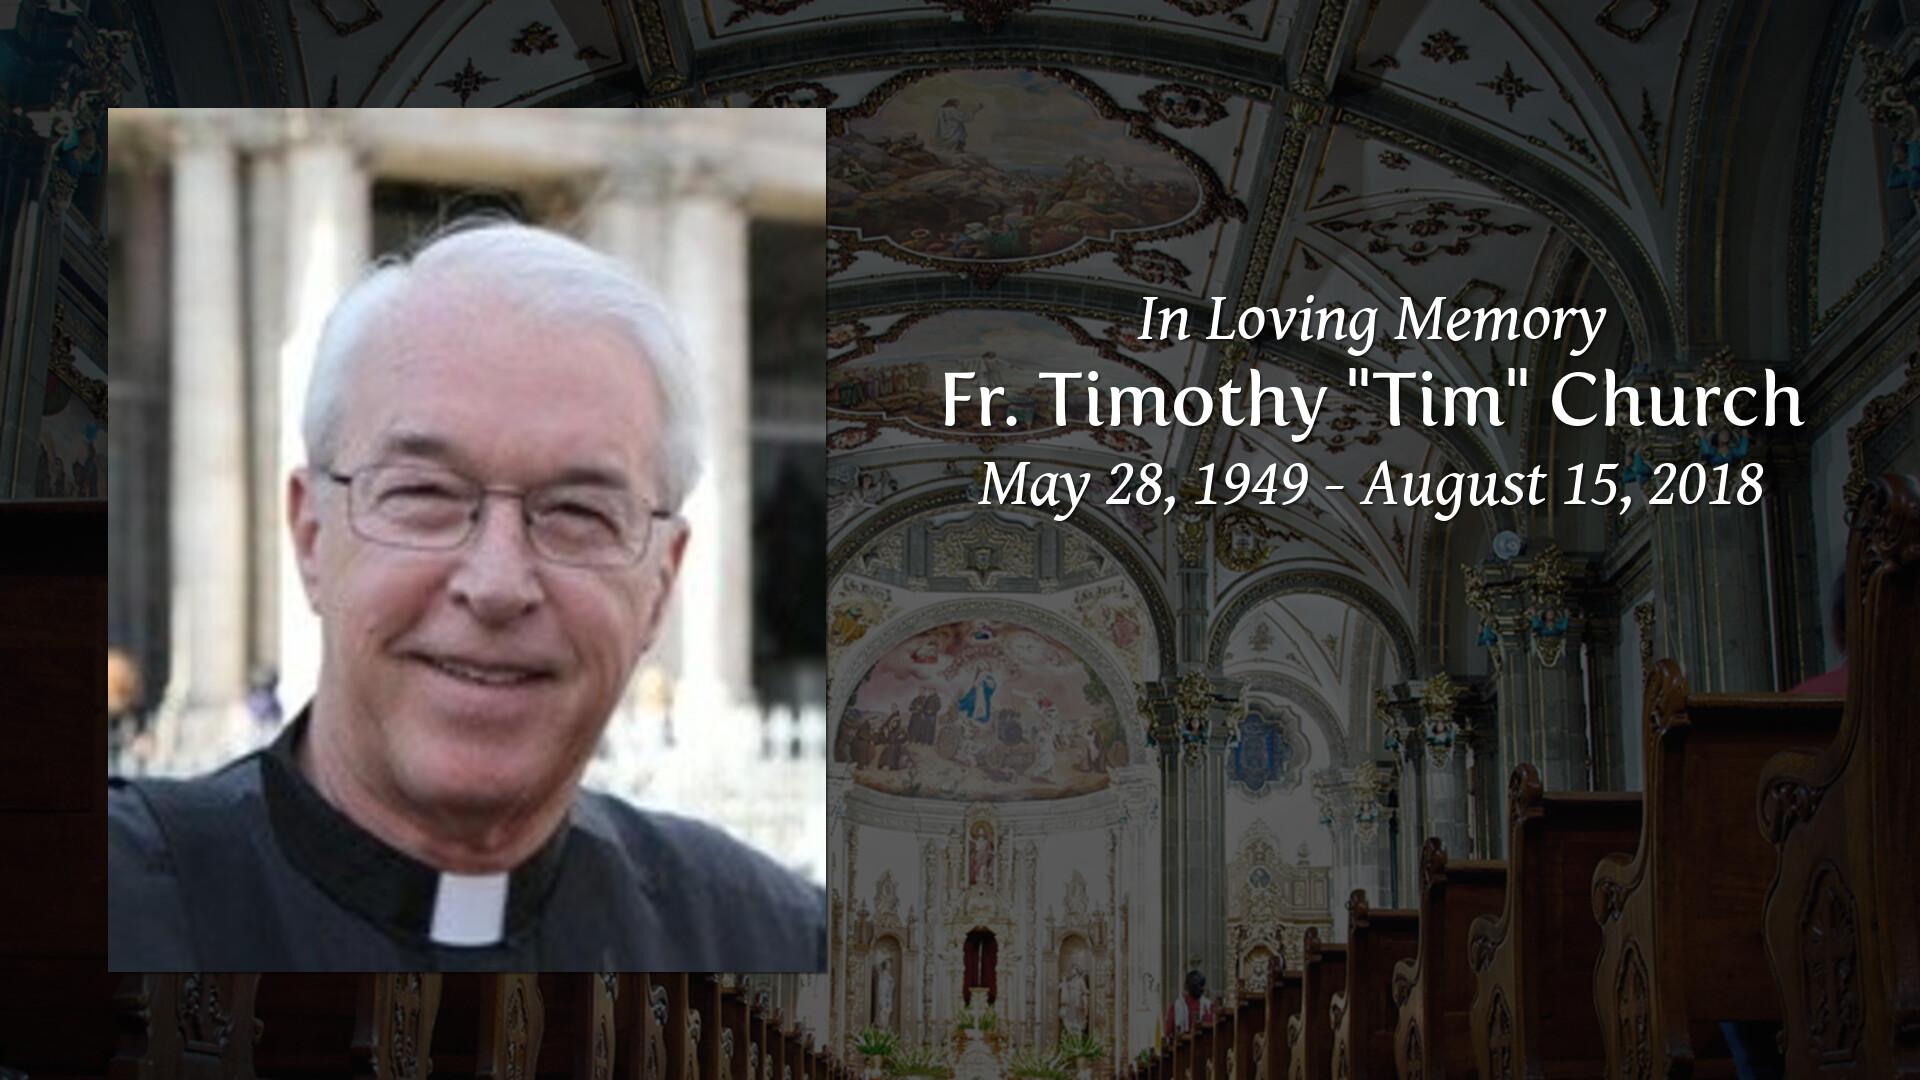 Obituary | Fr  Timothy (Tim) Church of Allen, Texas | ALLEN FAMILY